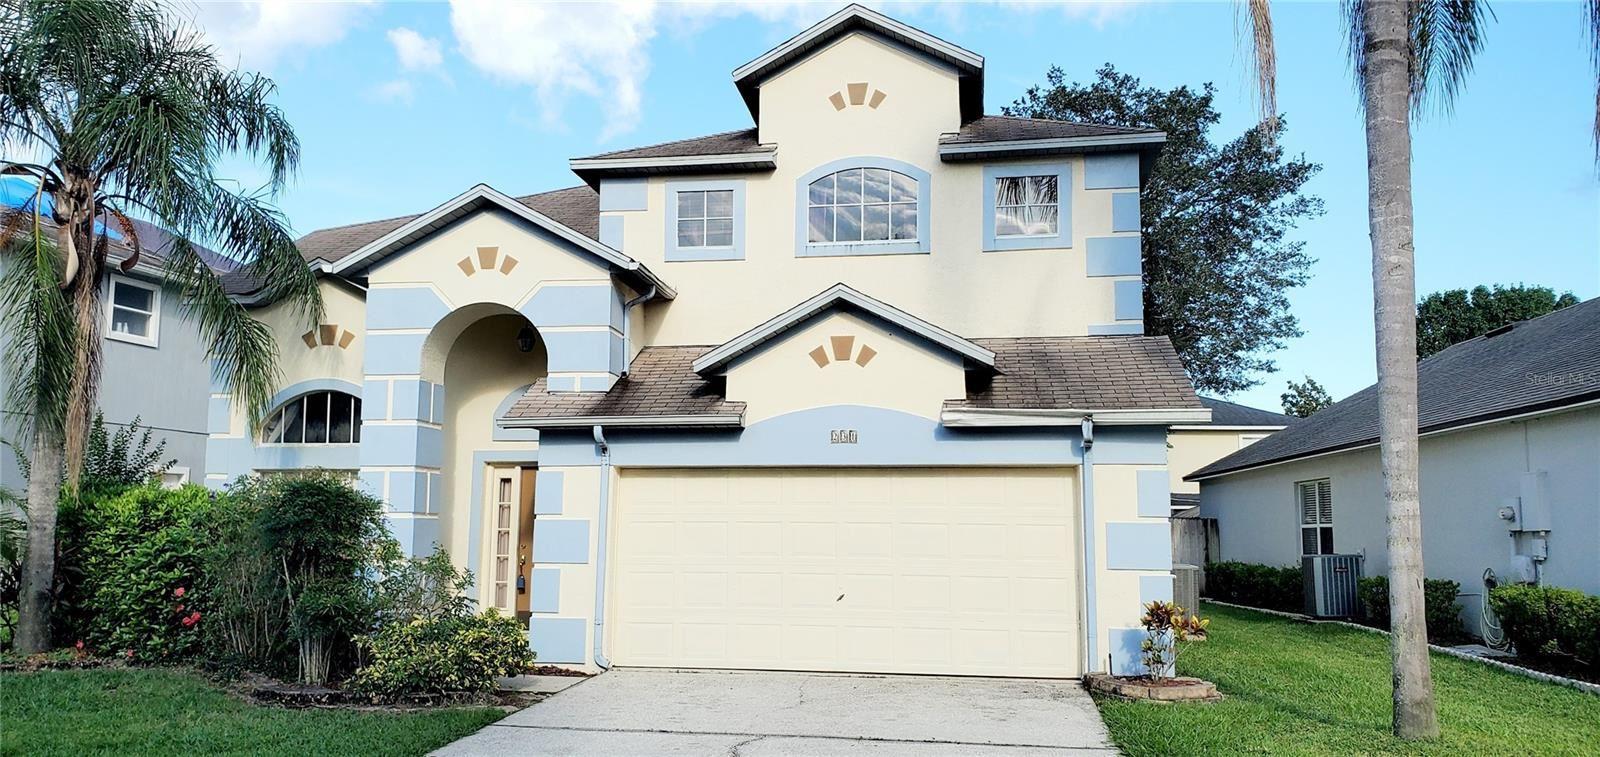 231 PRAIRIE DUNE WAY, Orlando, FL 32828 - #: O5971808